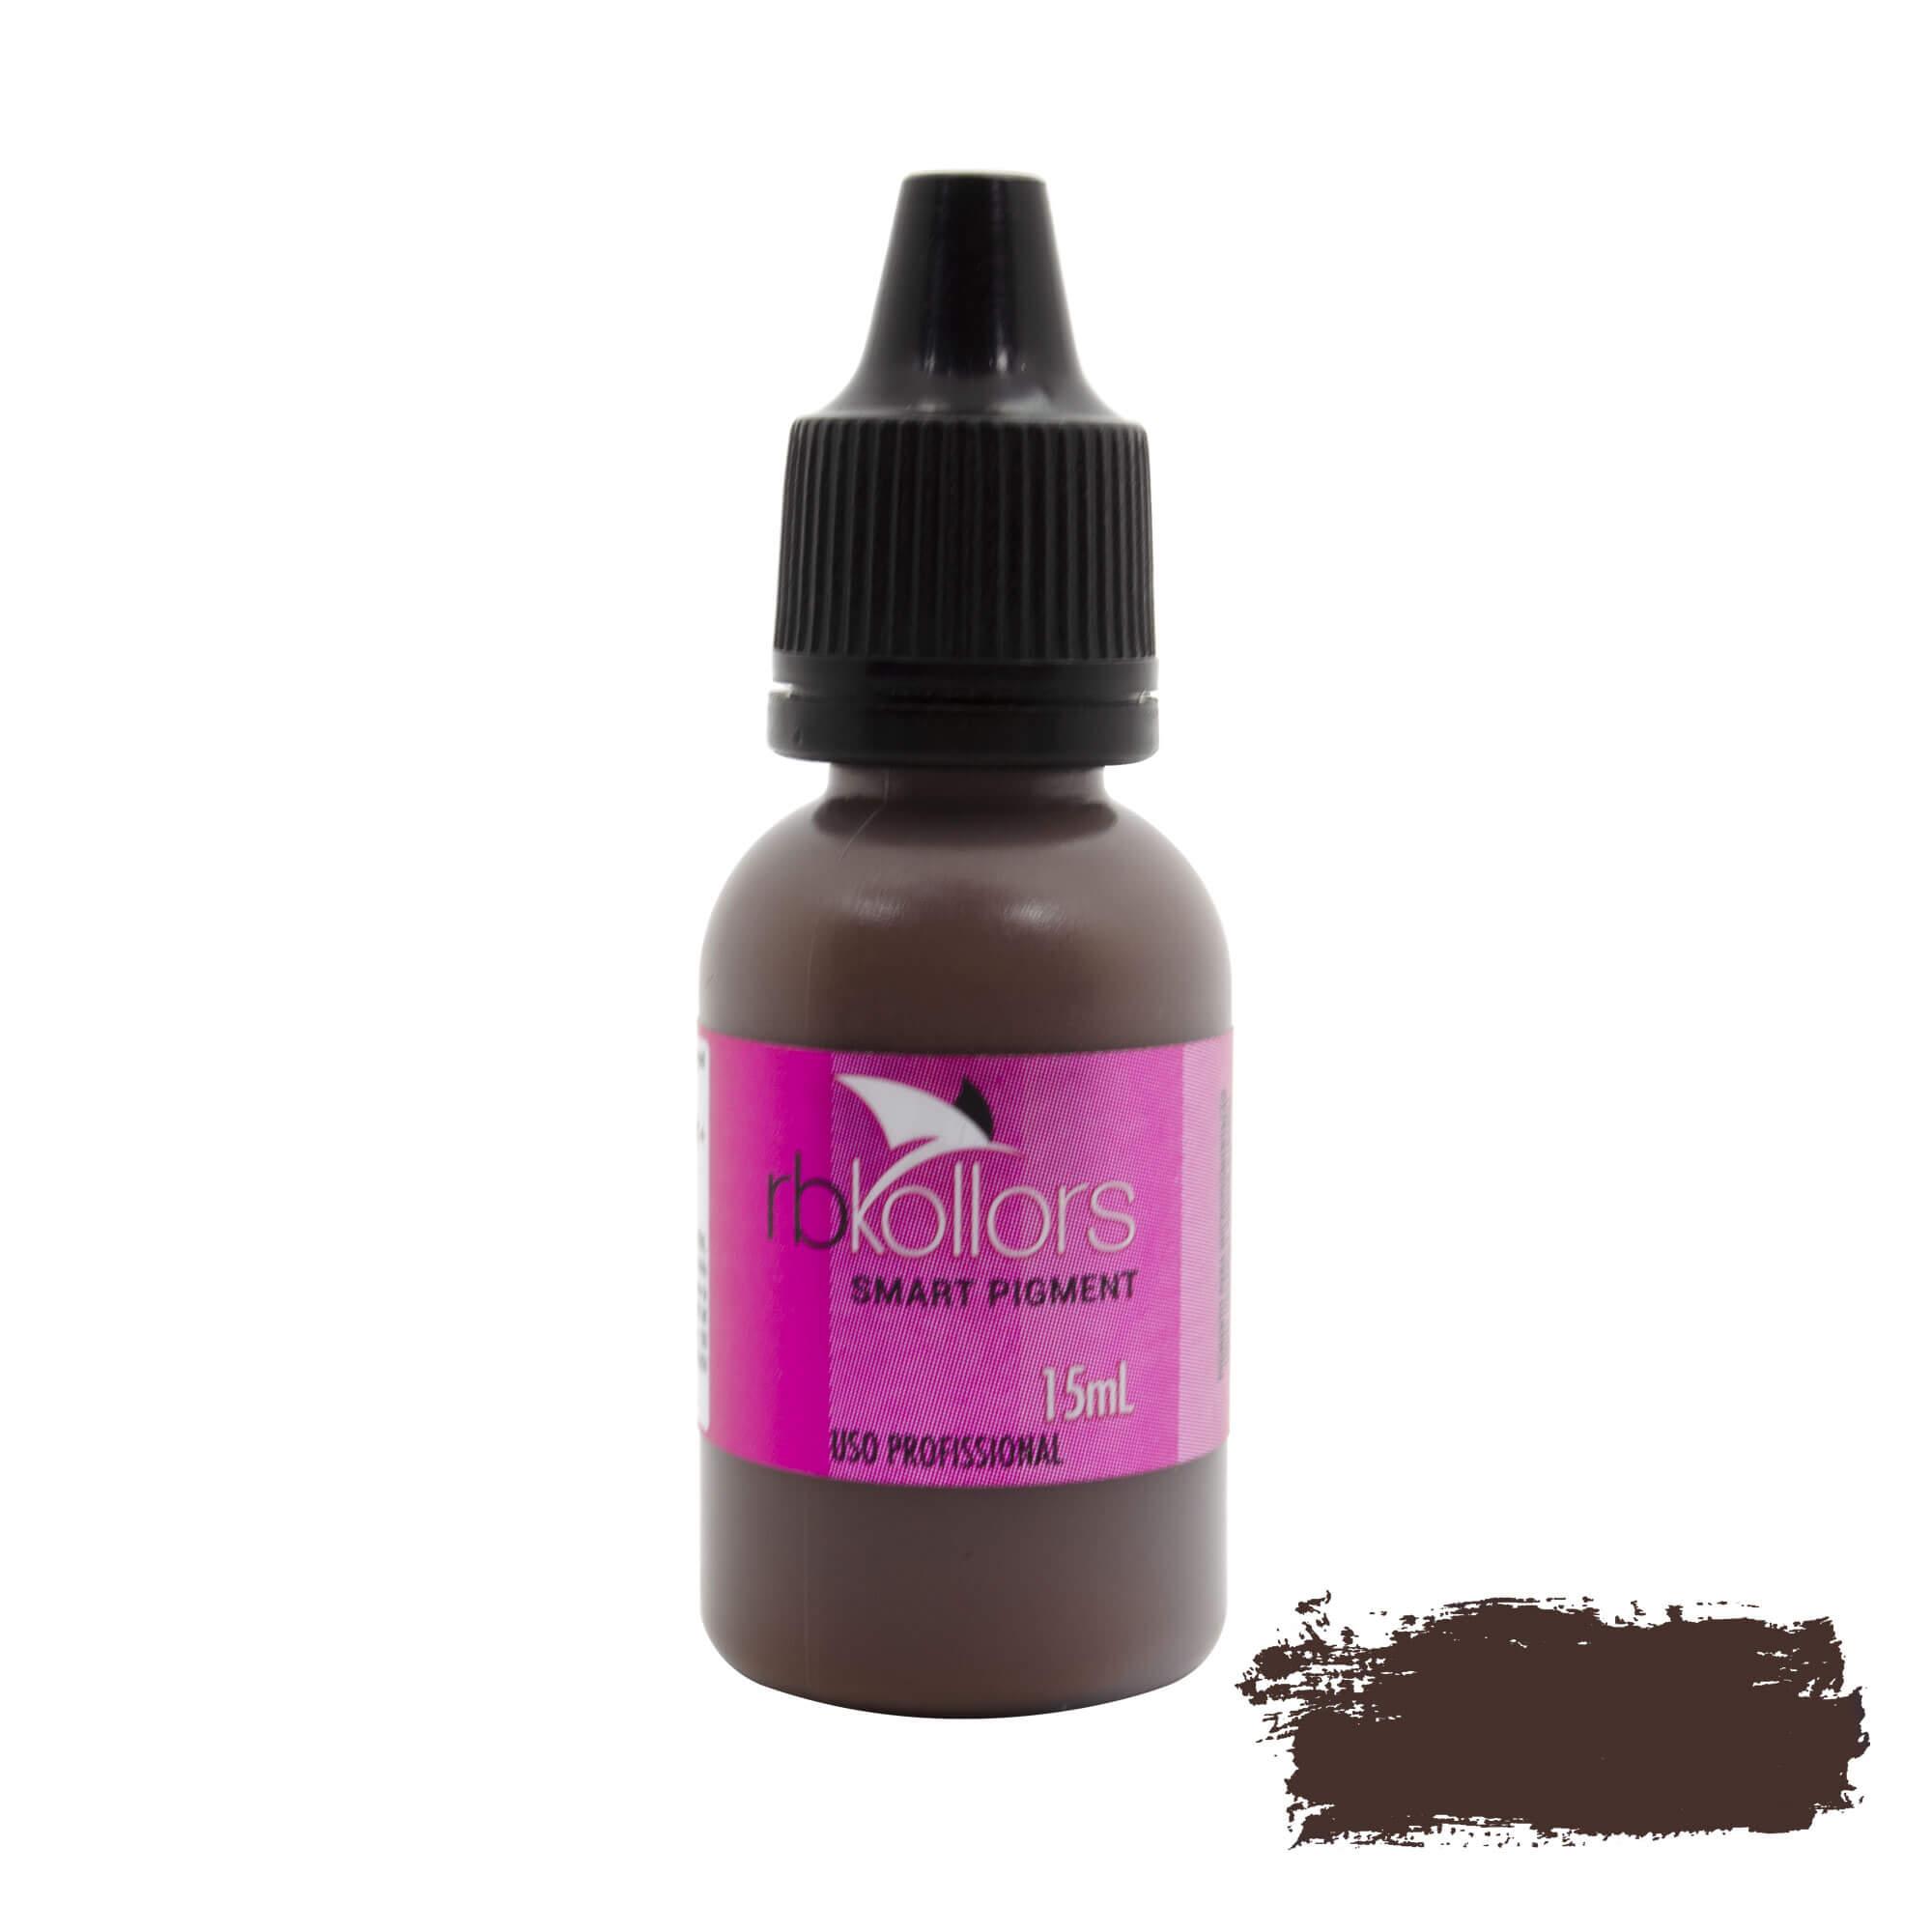 Pigmento Rb Kollors 15ml Ombre 2